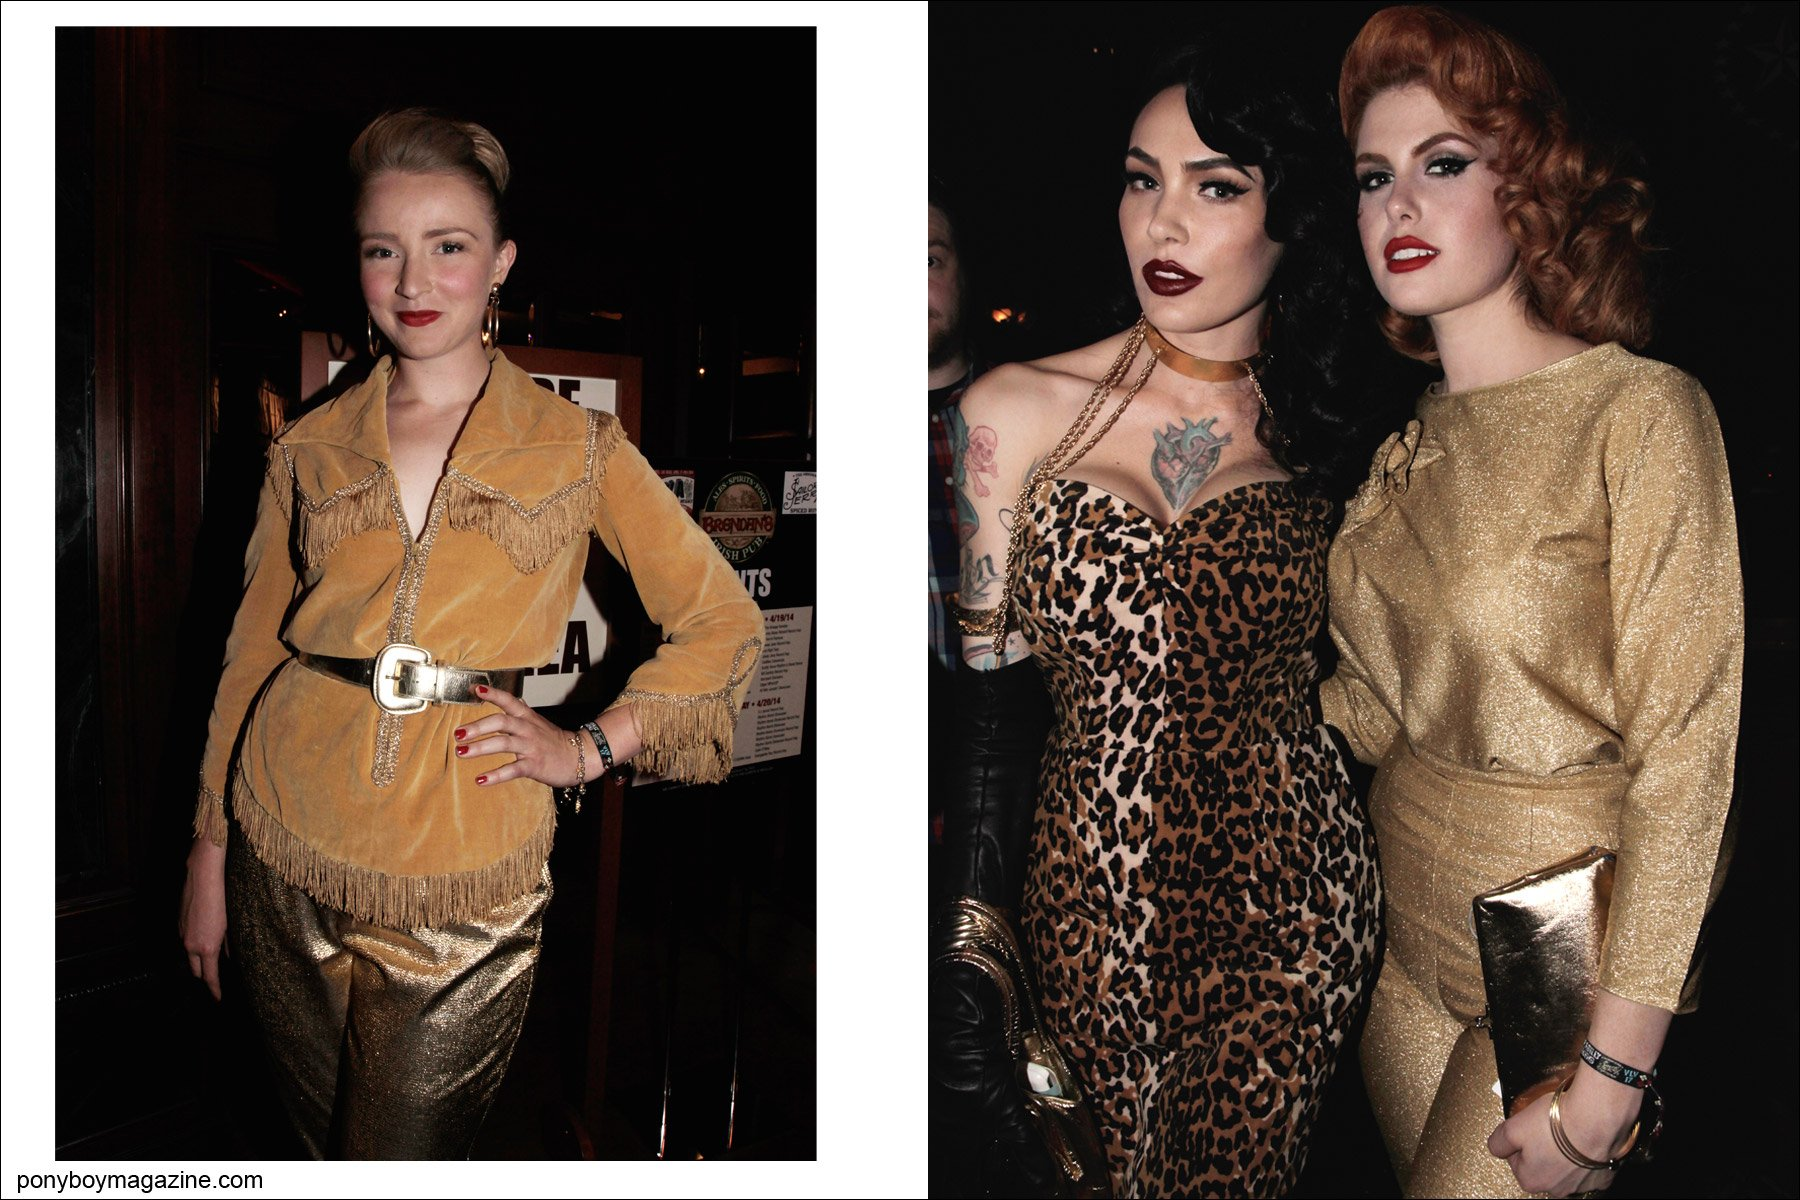 Rockabilly ladies photographed at Viva Las Vegas 17 for Ponyboy Magazine by Alexander Thompson.